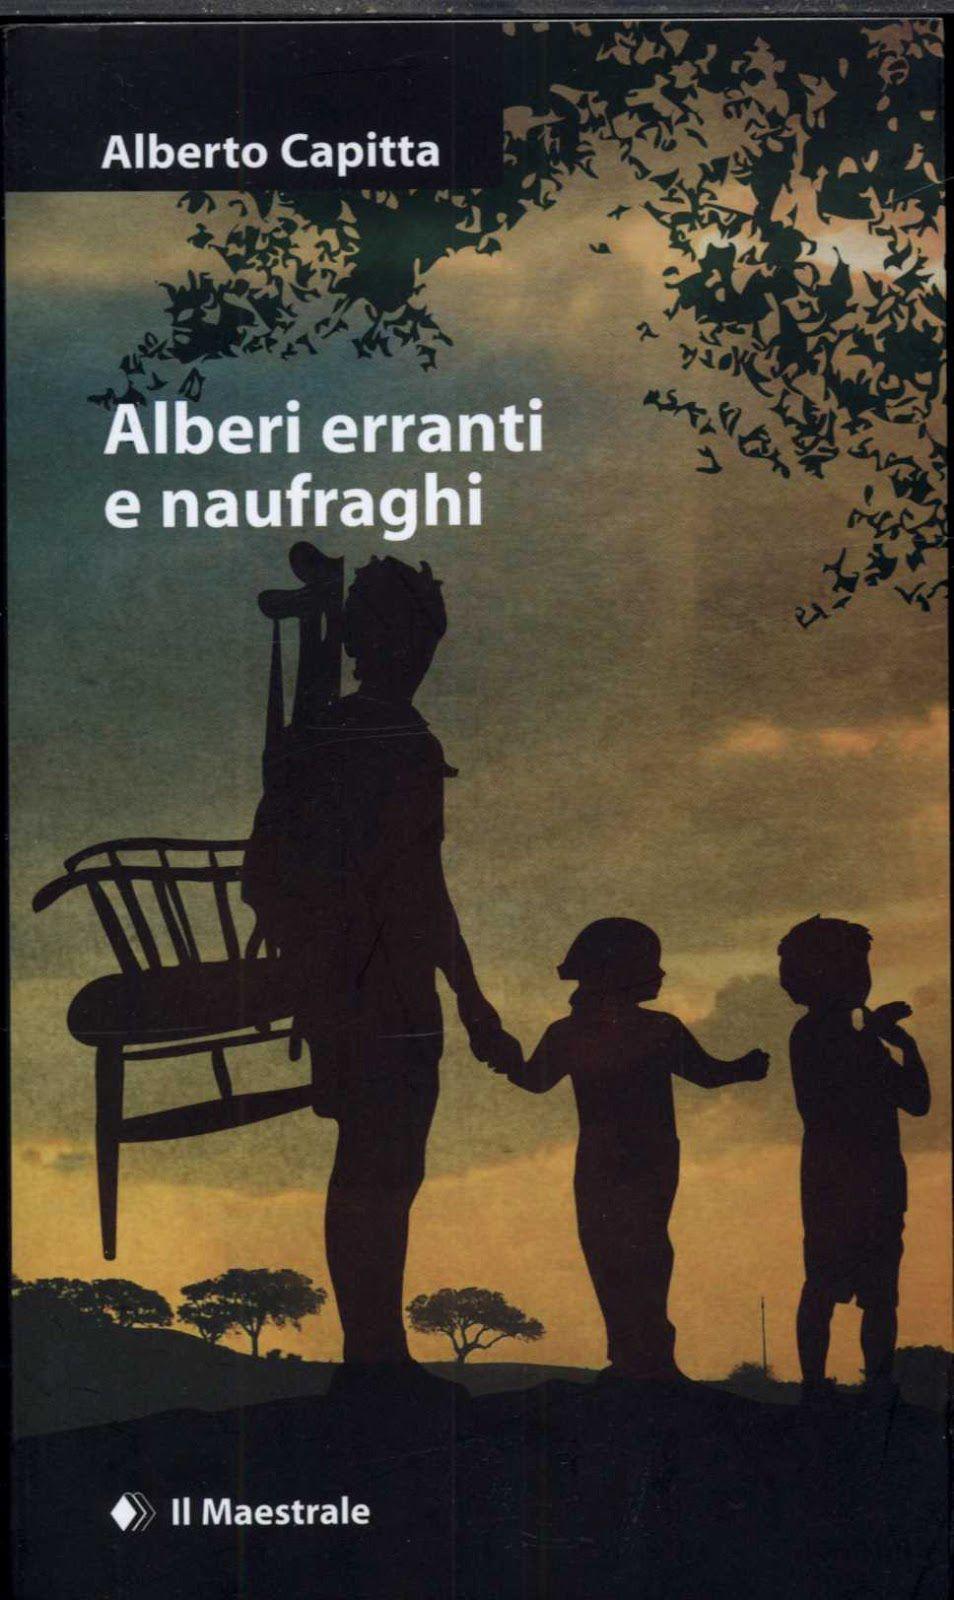 capitta_alberi_naufraghi